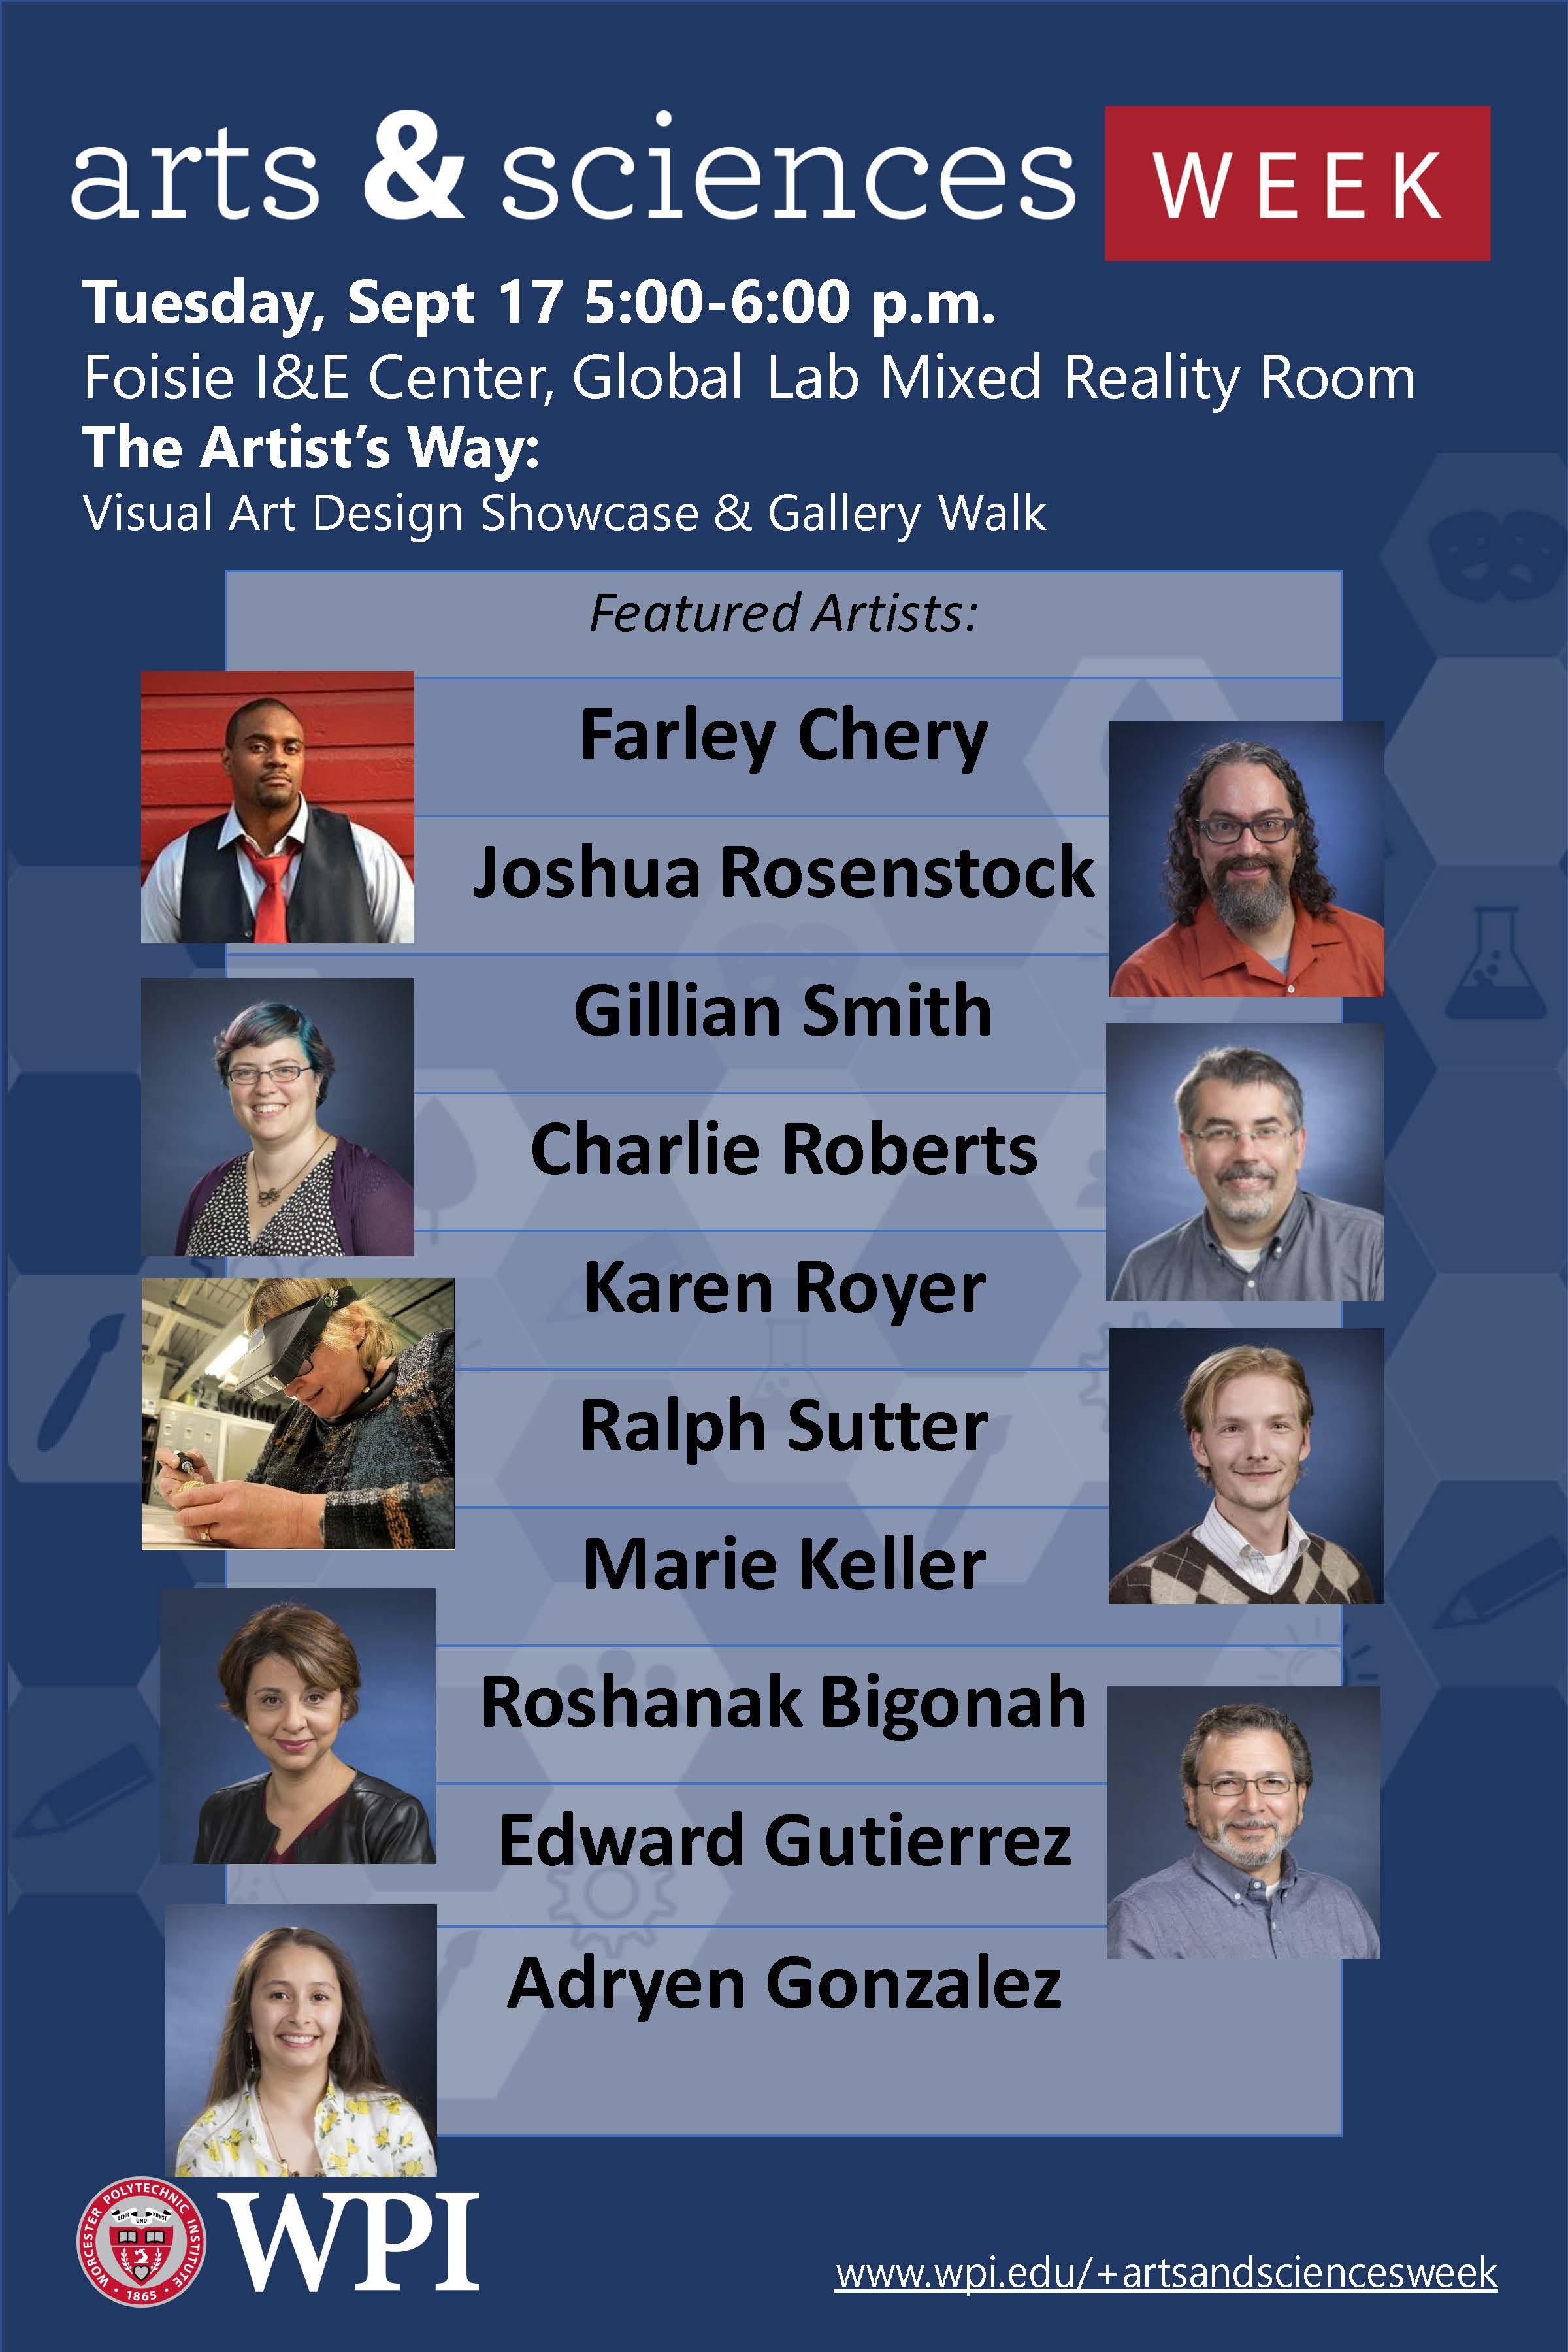 Visual Arts Design Showcase and Gallery Walk